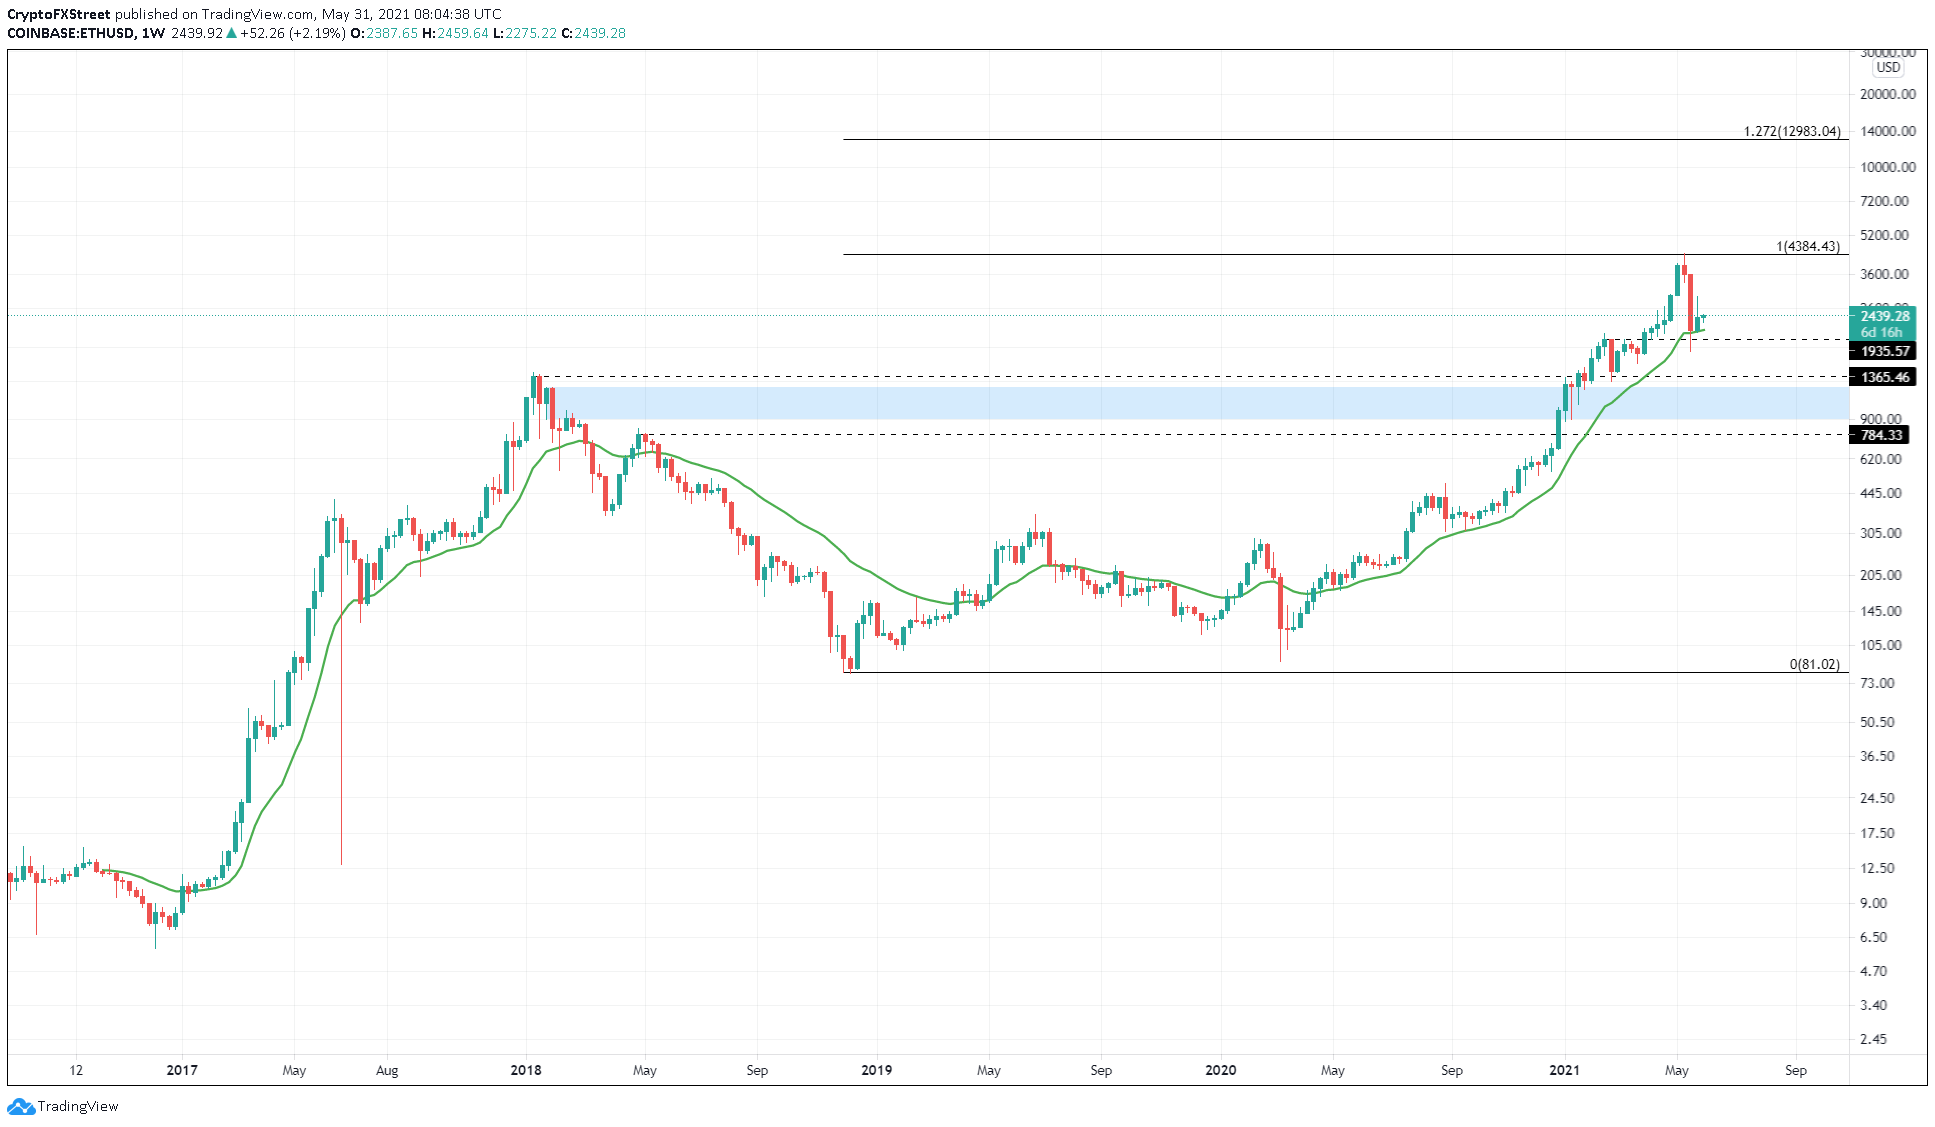 Graphique ETH / USD sur 1 semaine